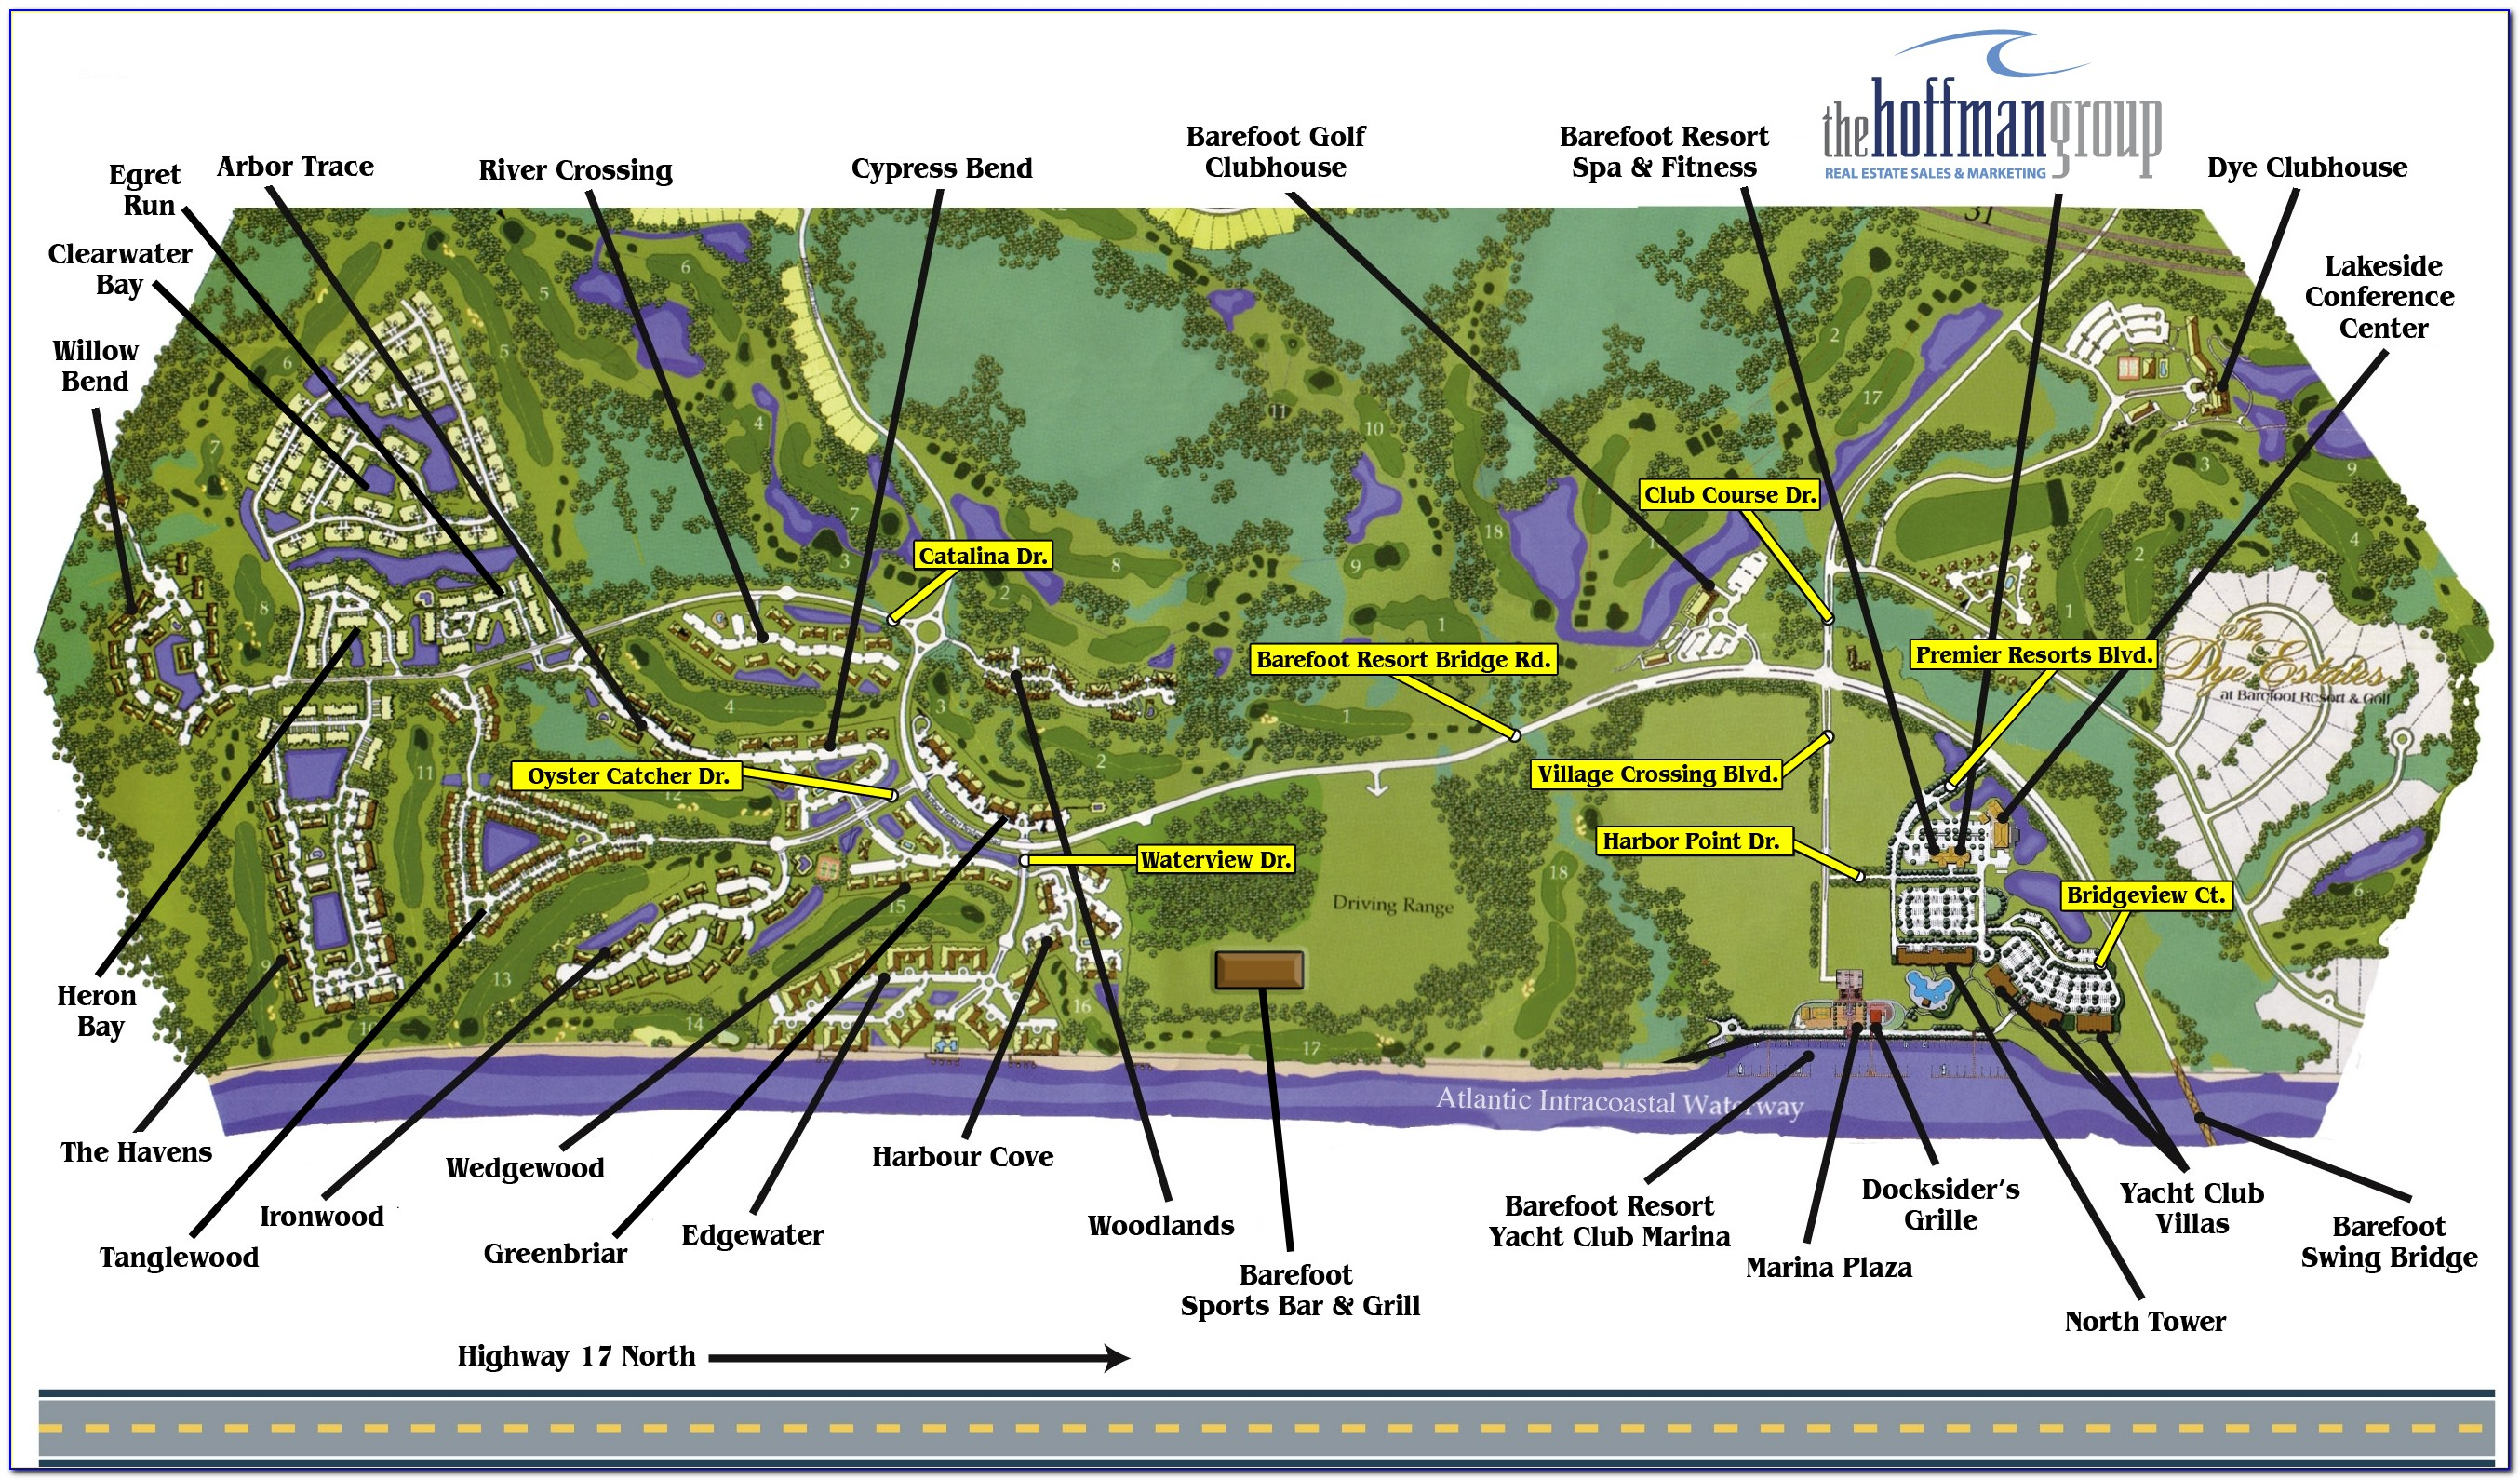 Golf Myrtle Beach Sc Map